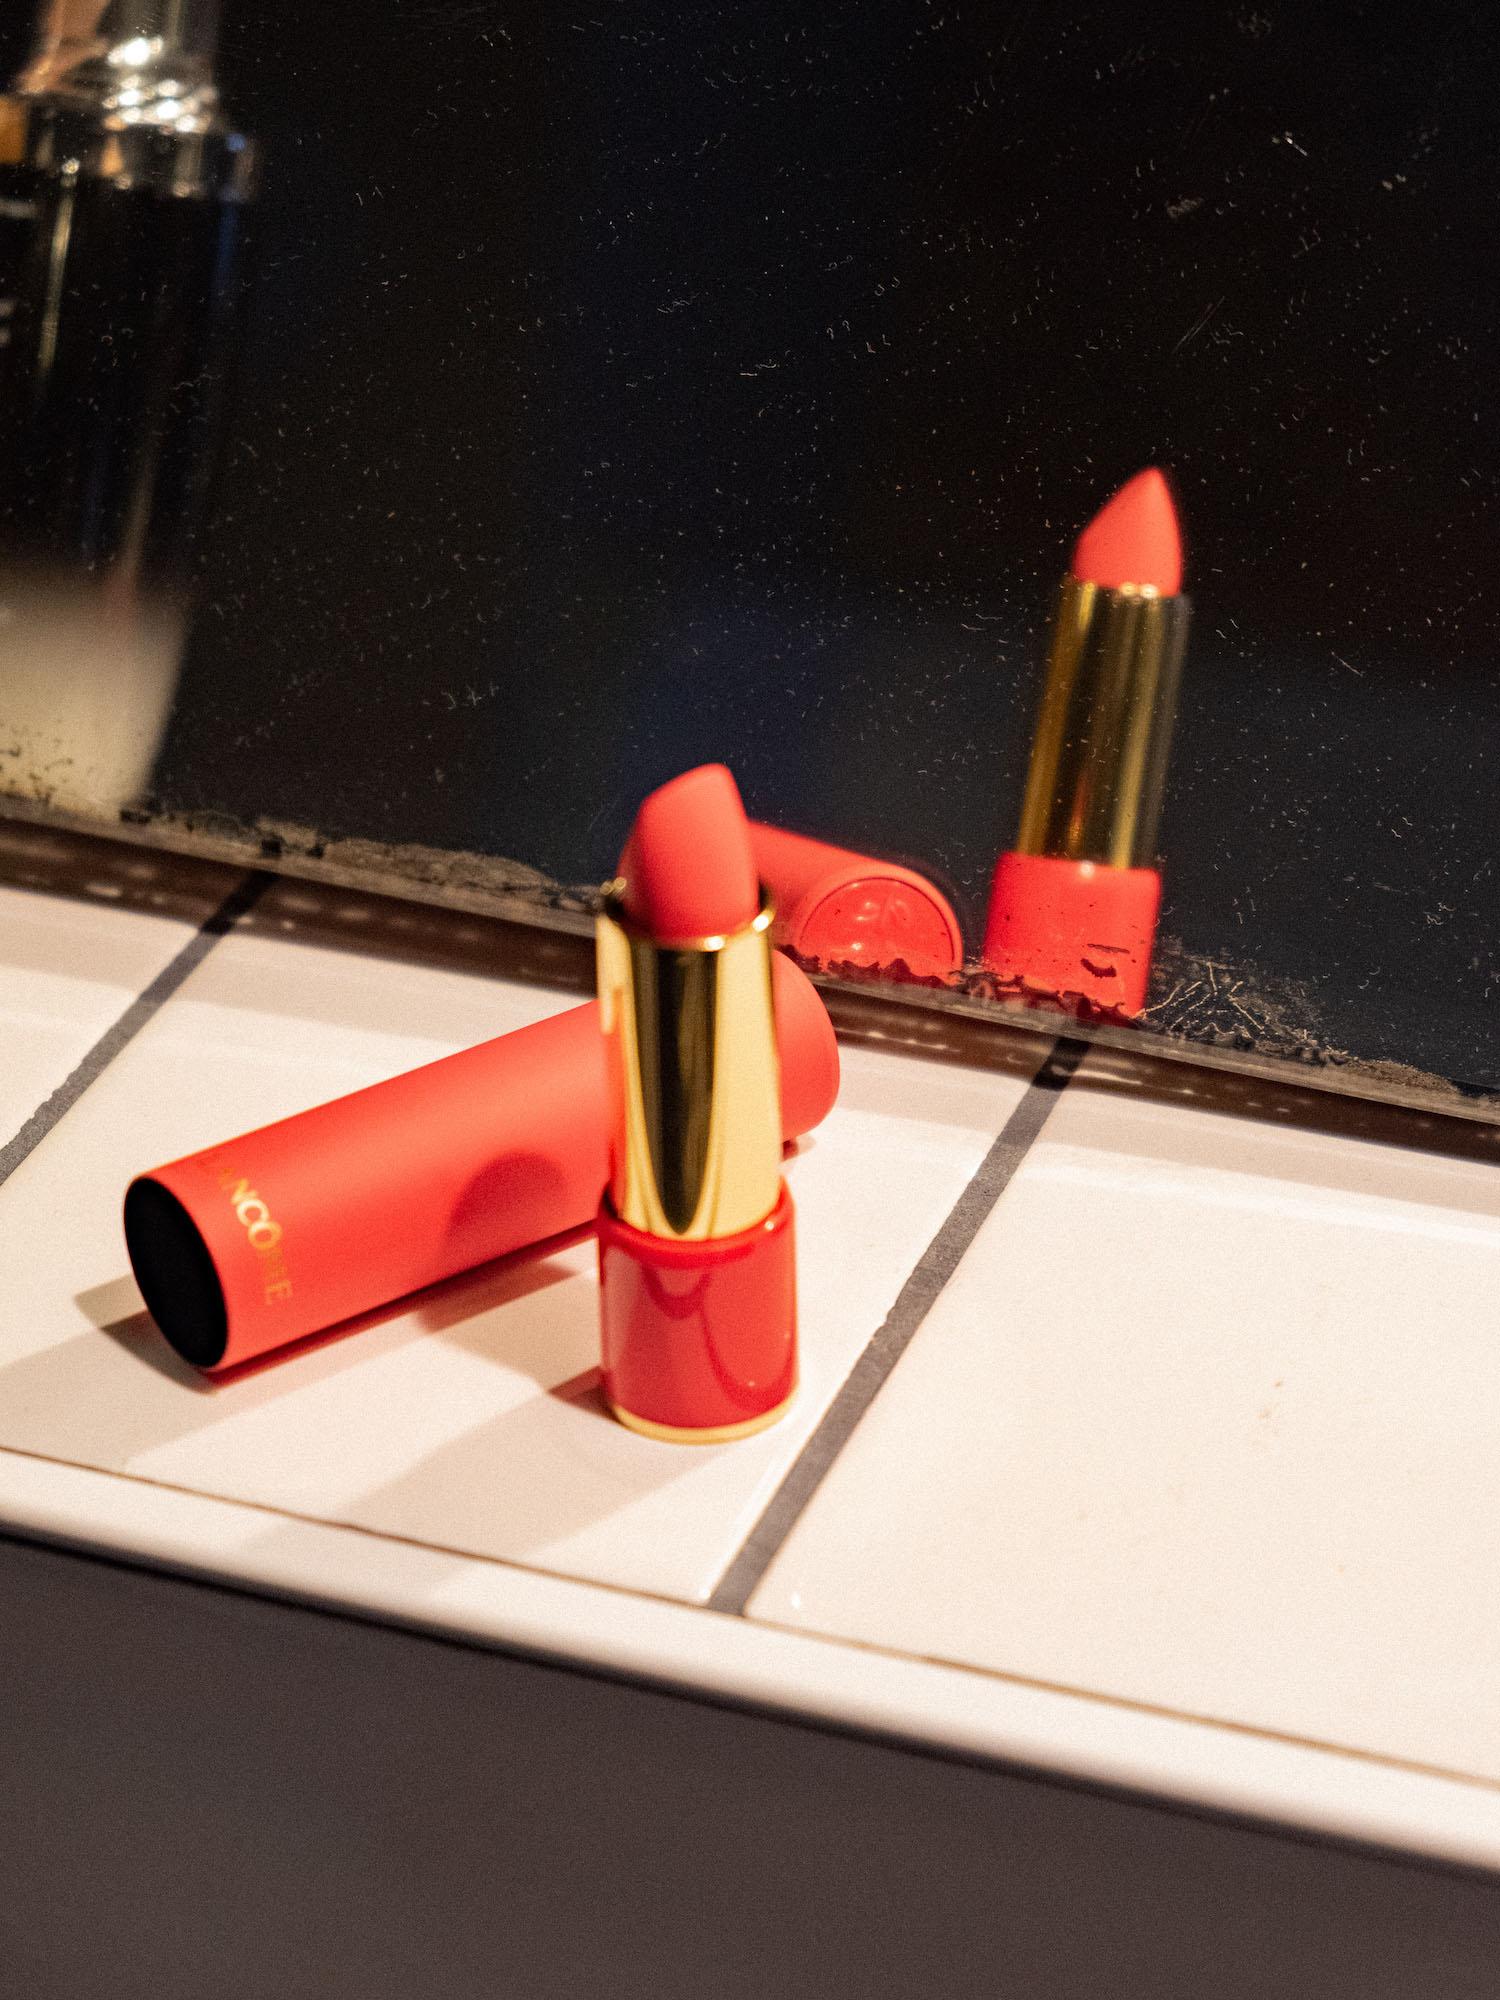 Bare Minds Beauty Adventskalender L'Absolu Rouge